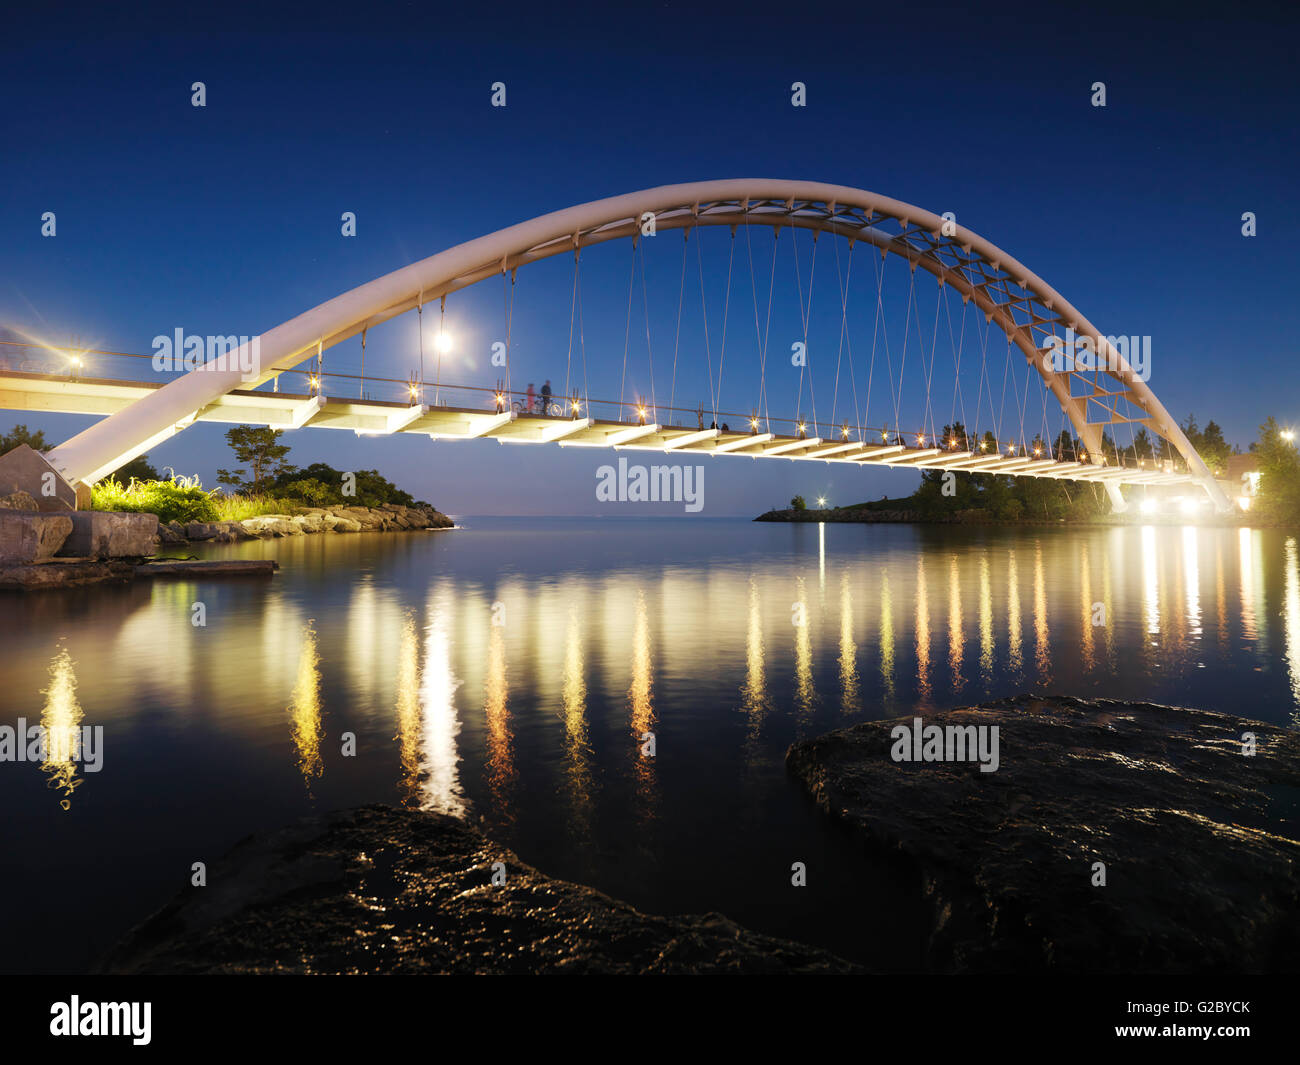 Humber River Arch Bridge at night, Toronto, Ontario Province, Canada - Stock Image